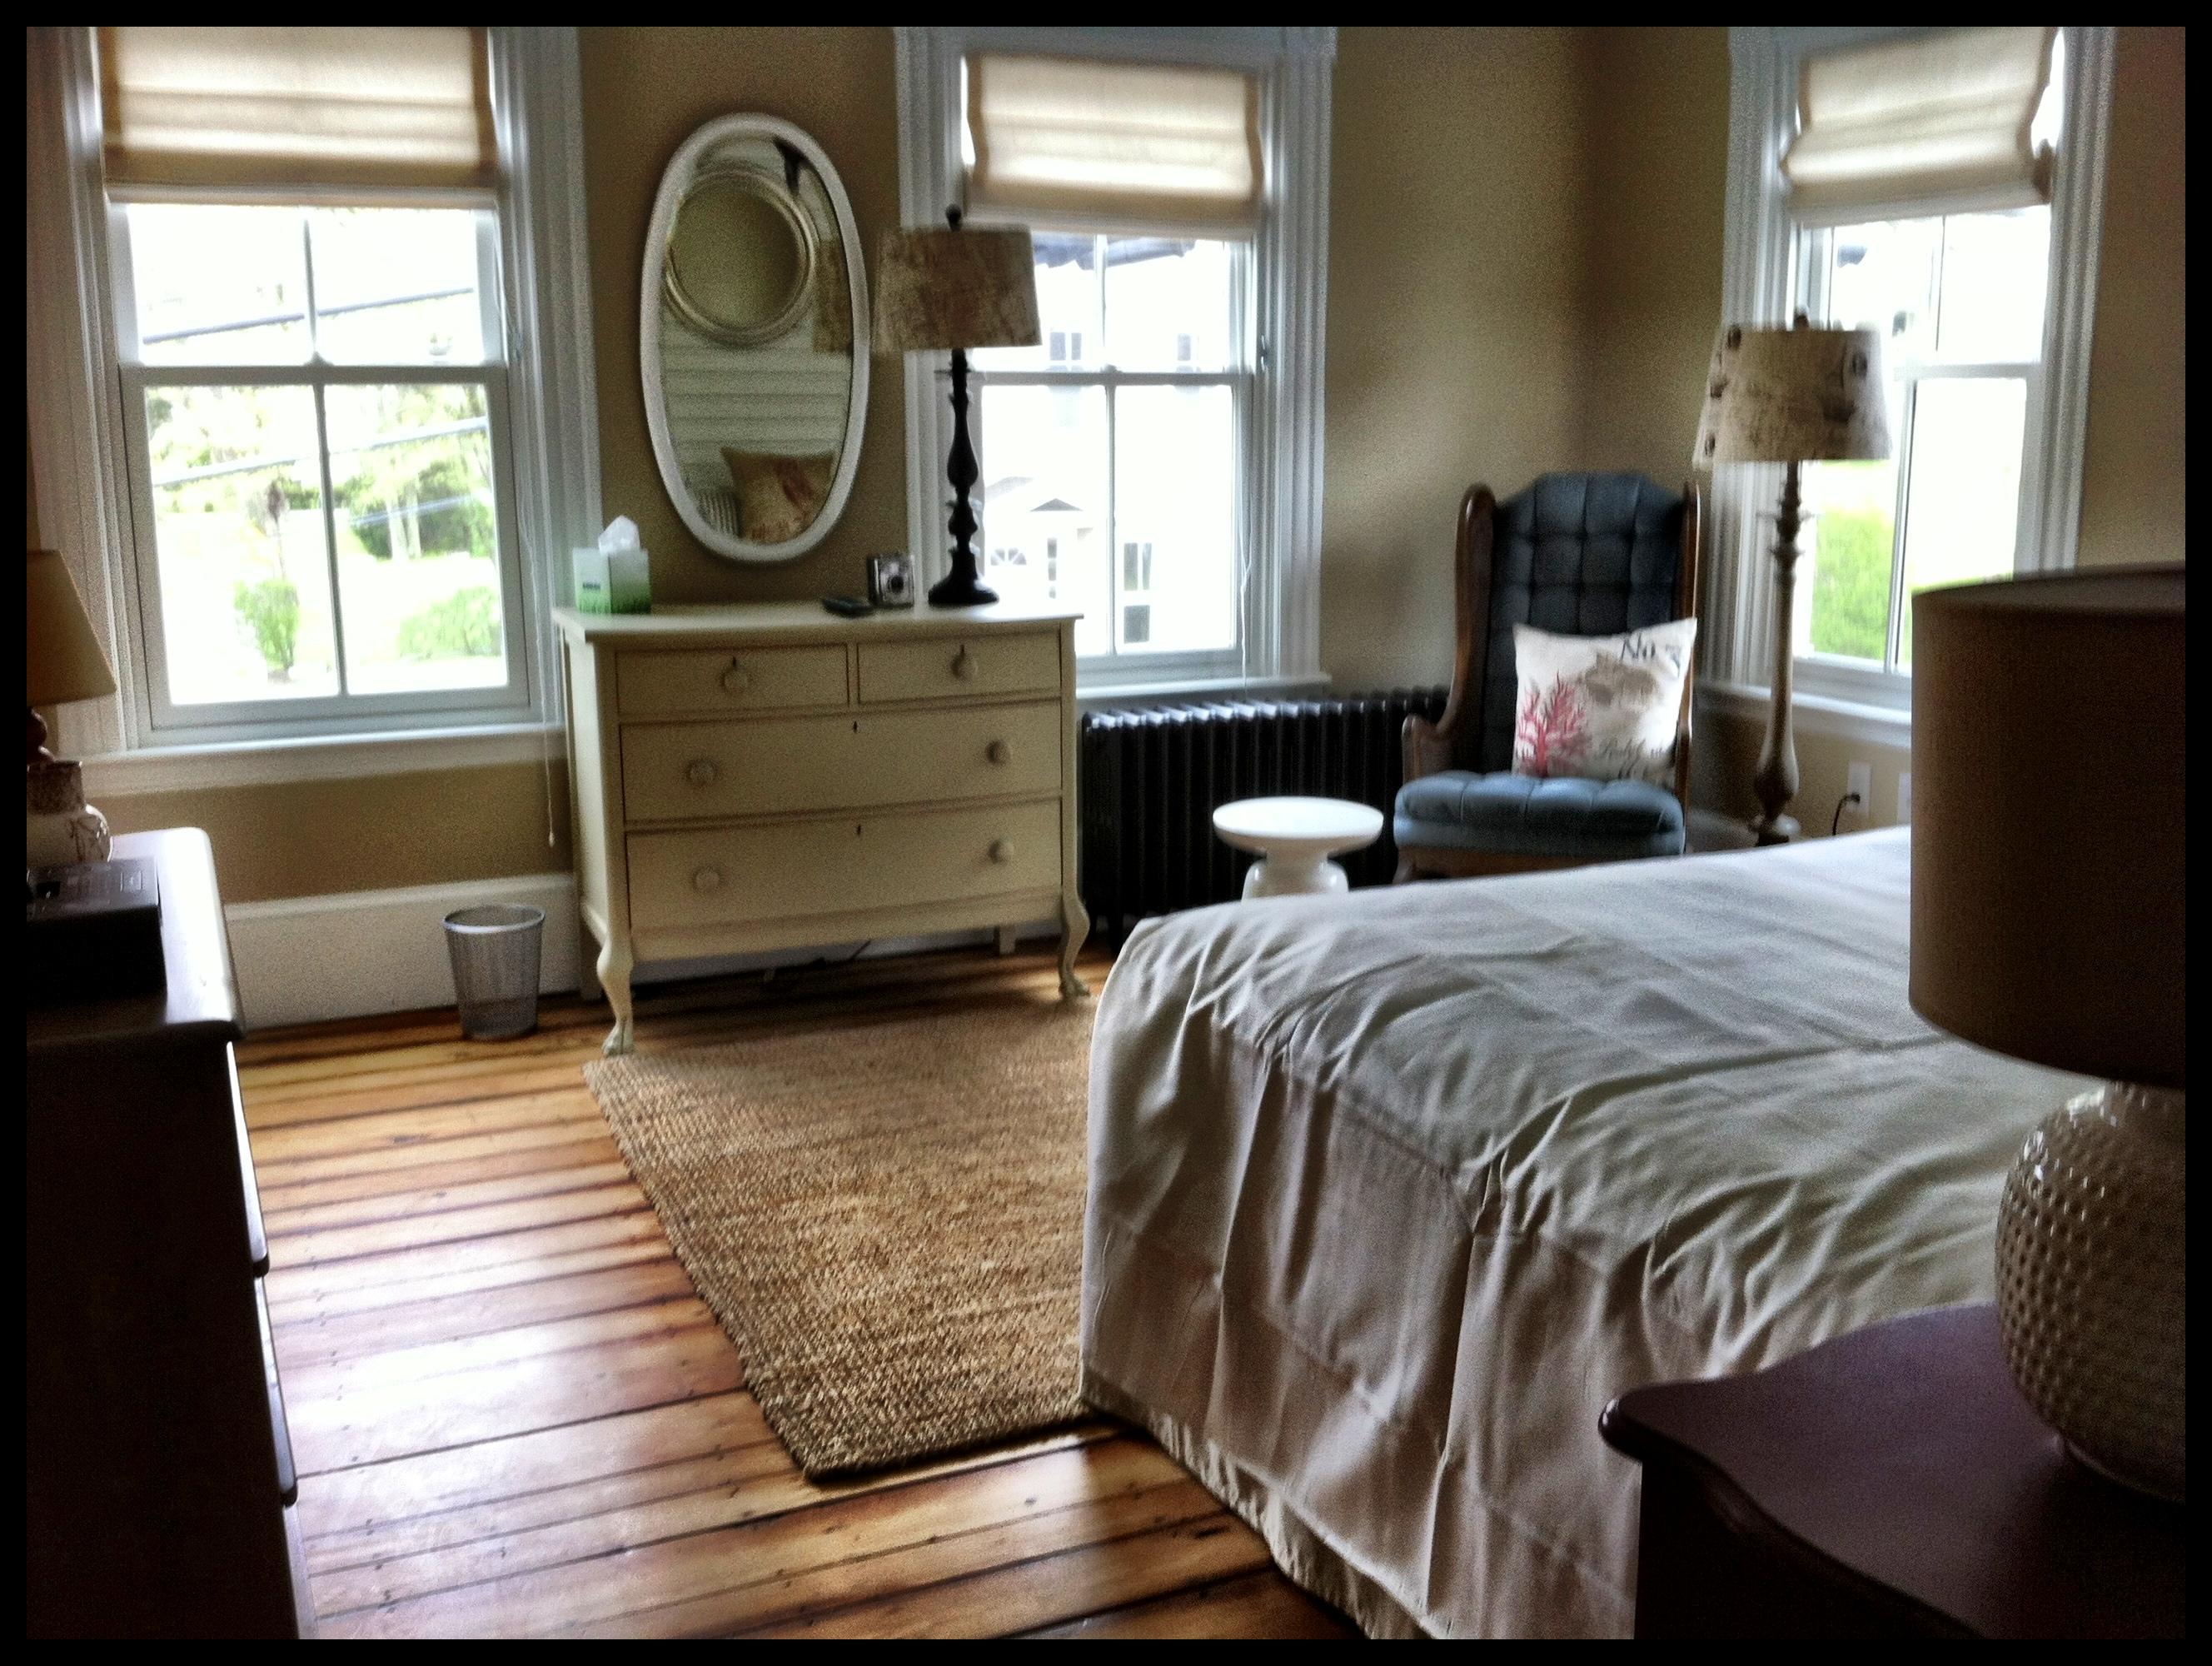 Vintage restored king room at the Woods Hole Inn.